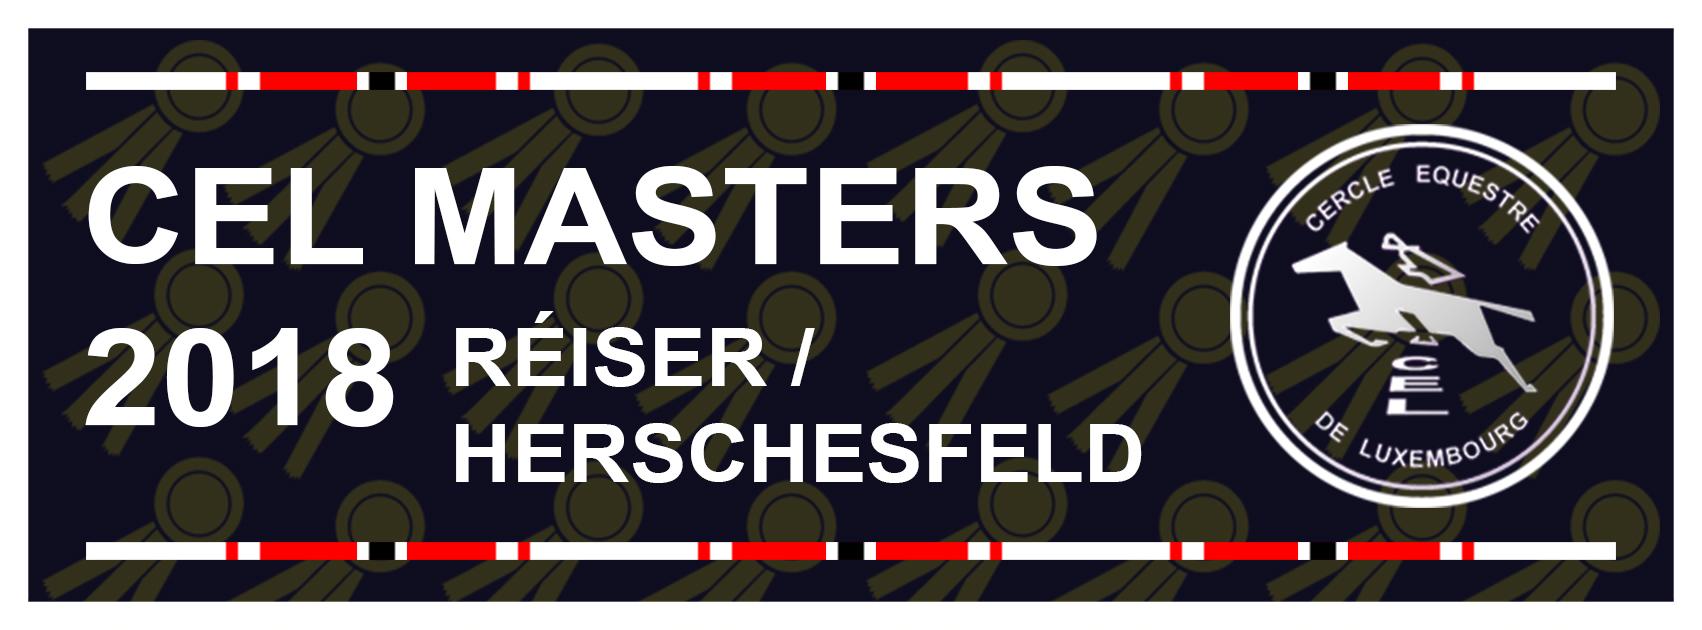 05-07.10.2018 - Ausschreibung Springturnier Roeser Herchesfeld - CEL MASTER 2018